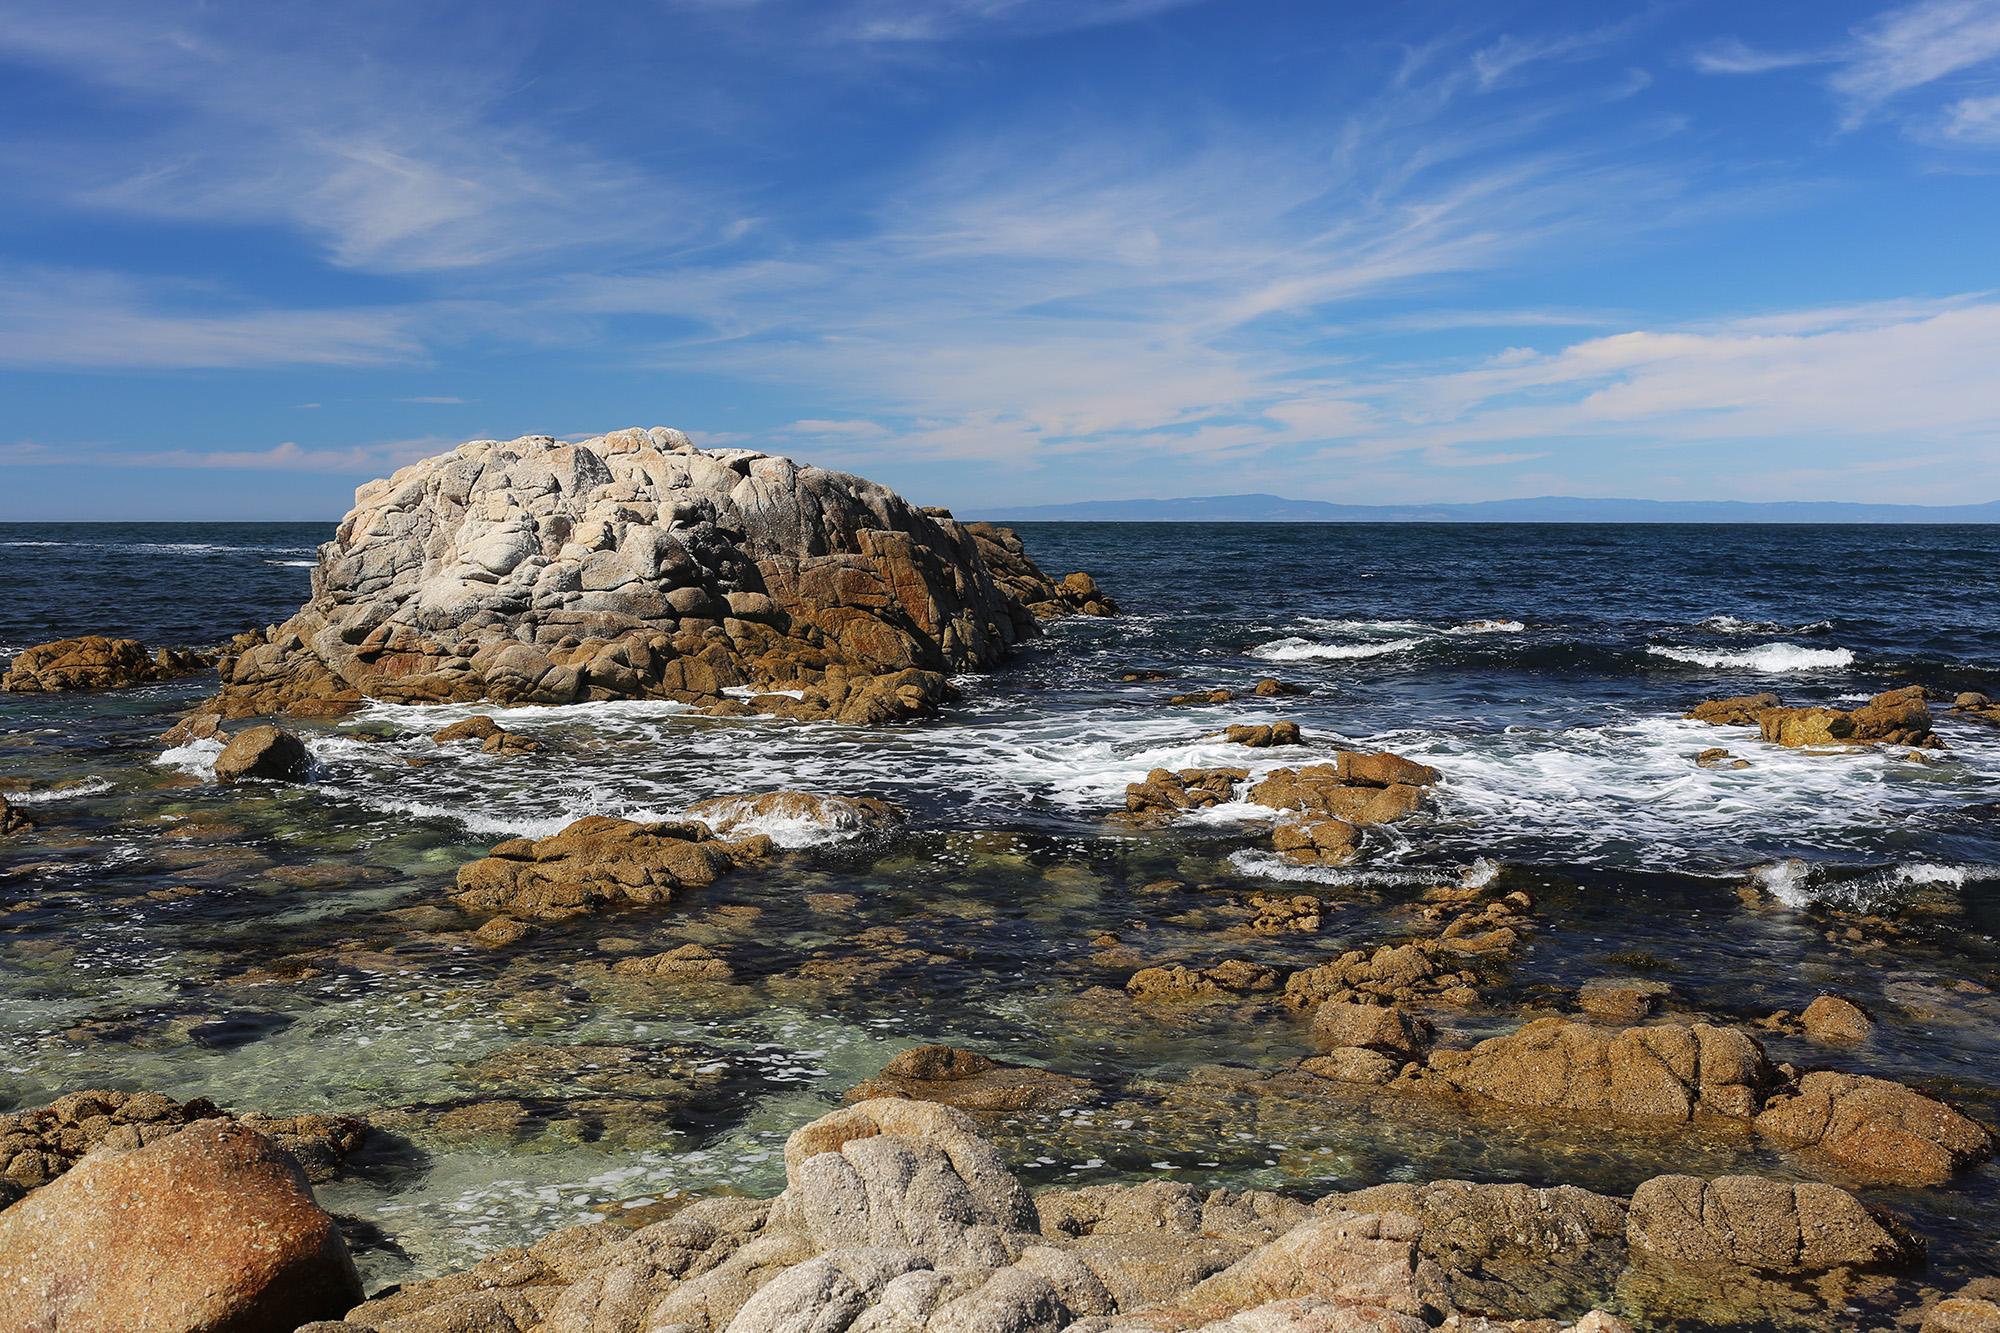 Rocky Shores by Rich J. Velasco